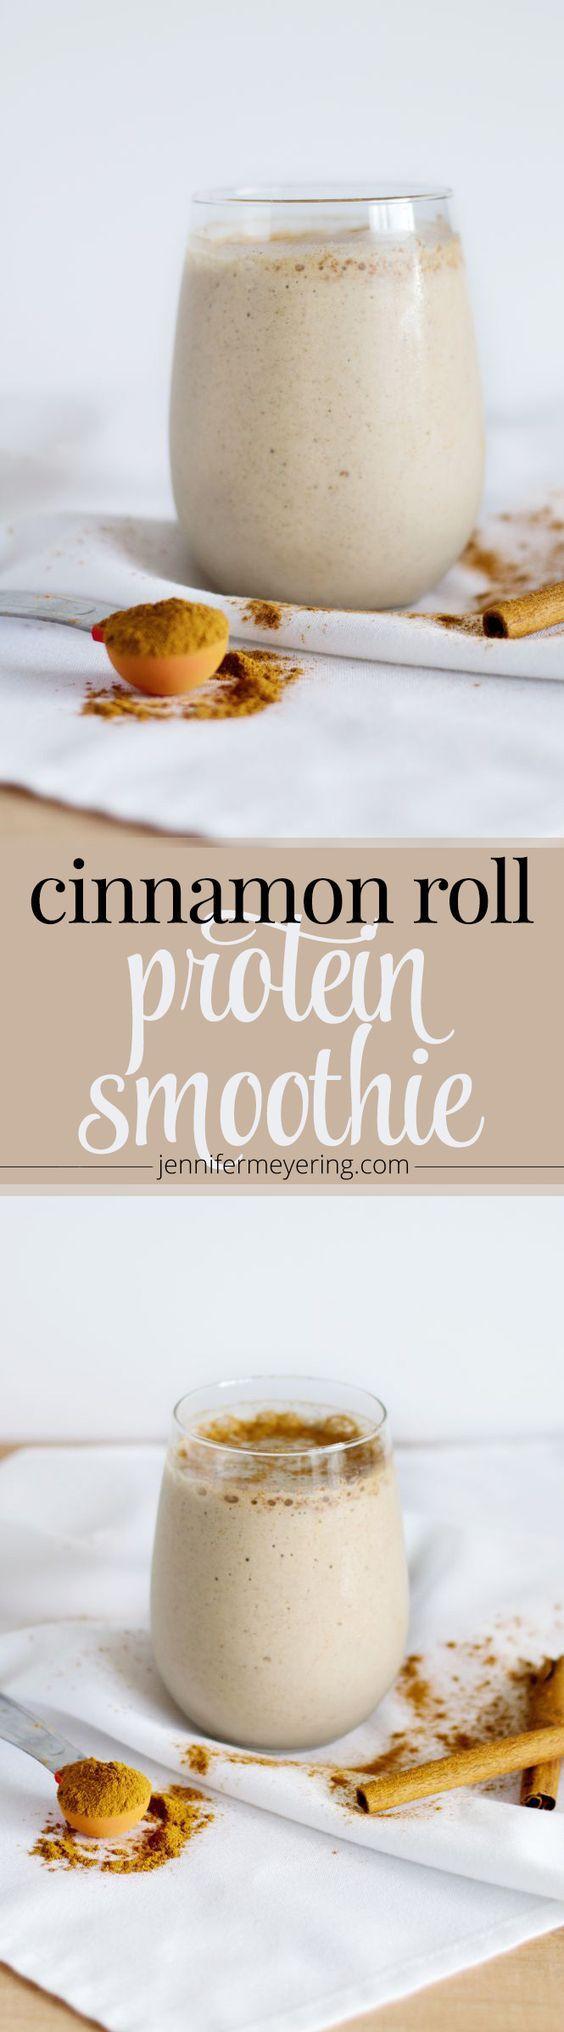 Cinnamon Roll Protein Smoothie | JenniferMeyering.com